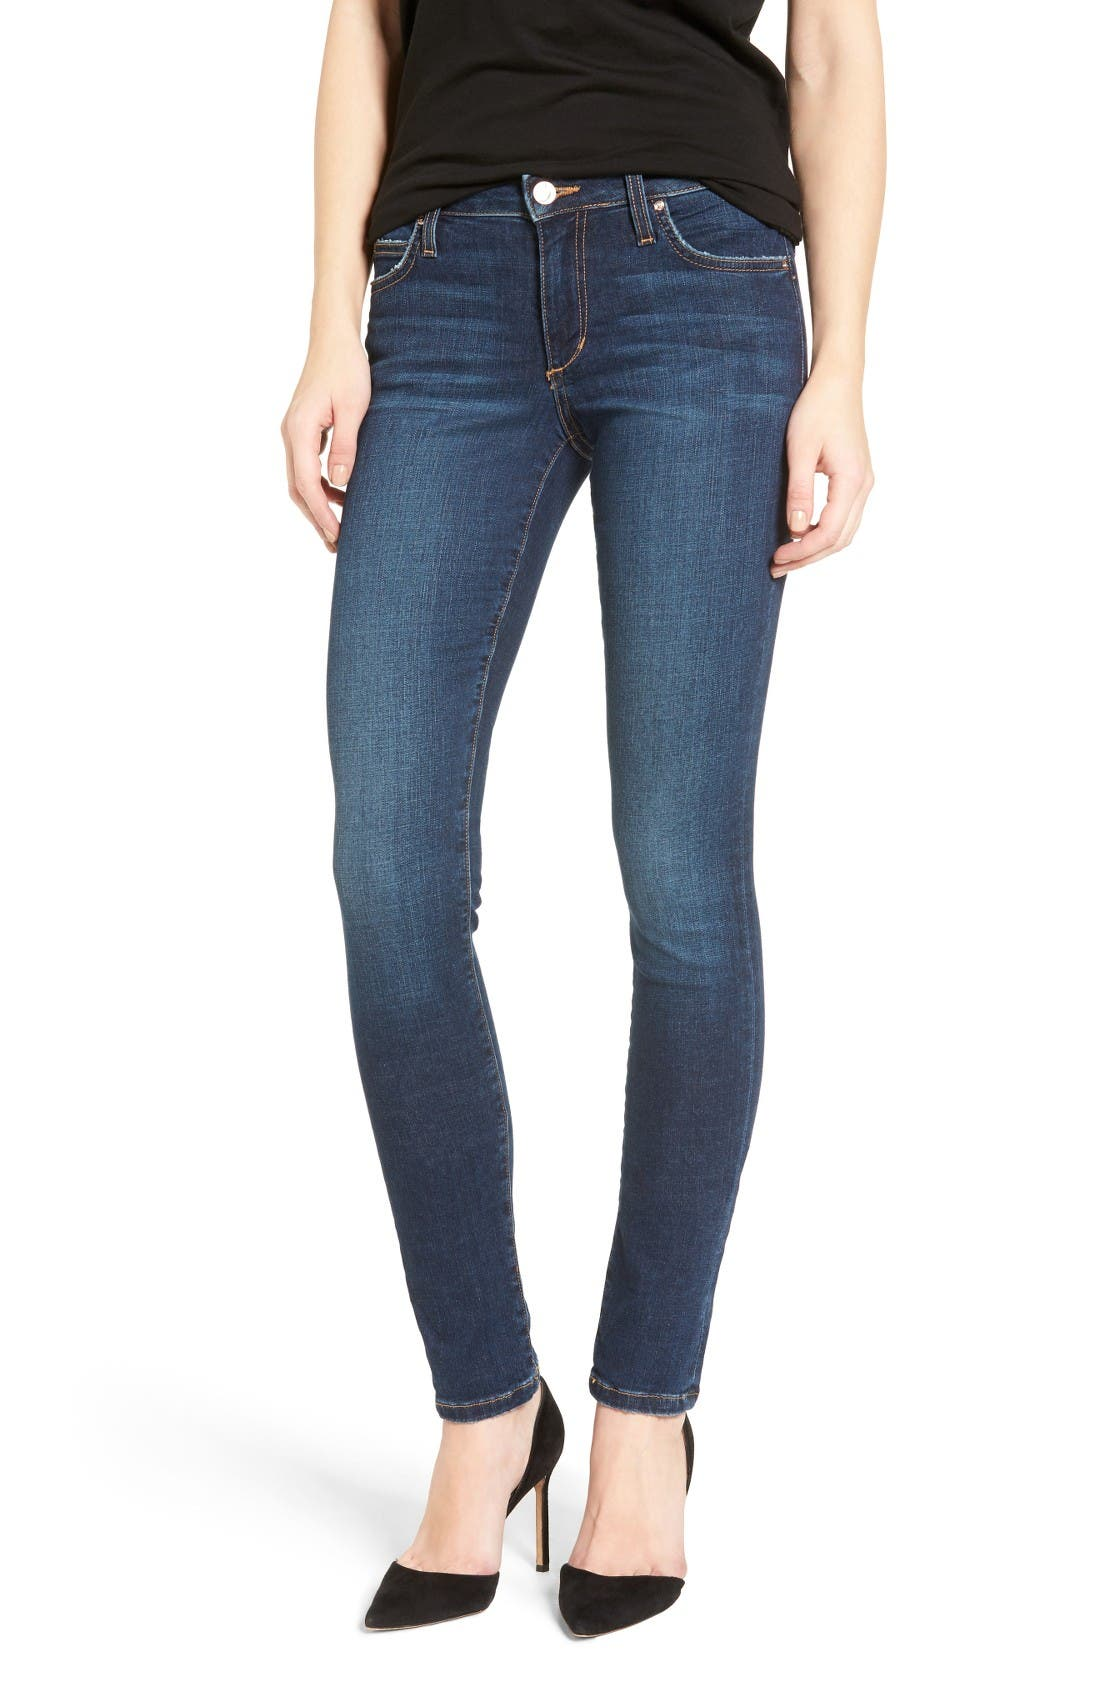 Main Image - Joe's Flawless - Honey Curvy Skinny Jeans (Tania)